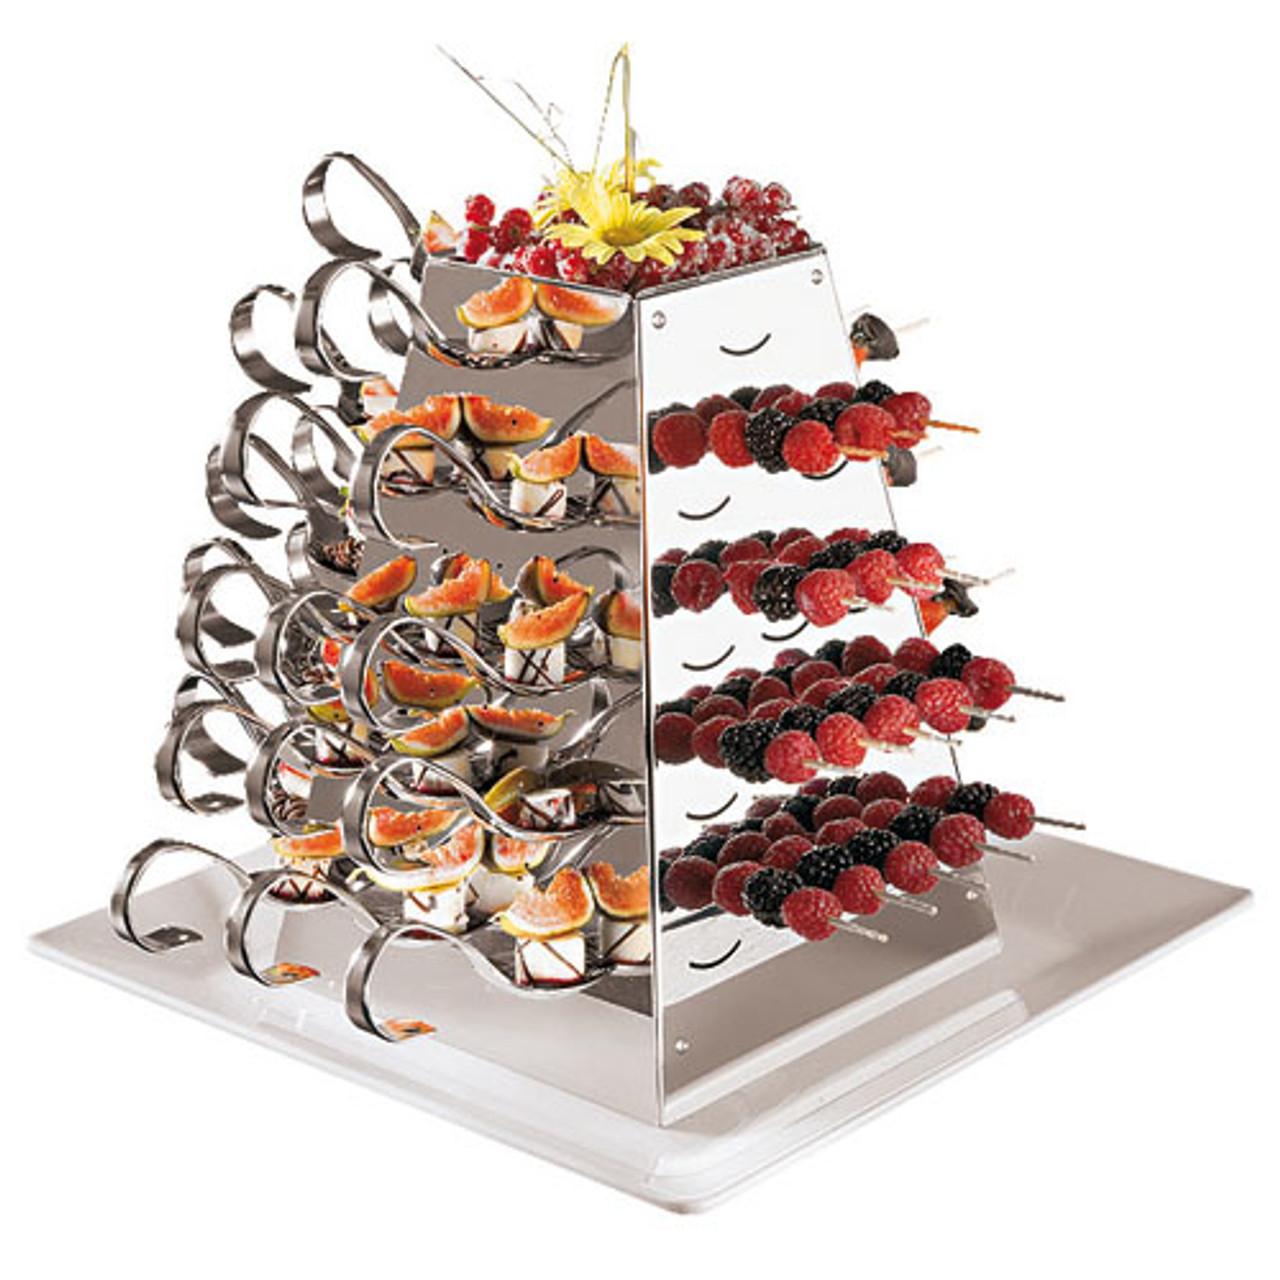 S/S Rotating Buffet Serving Pyramid, L 8.625 x W 8.625 x H 12.125